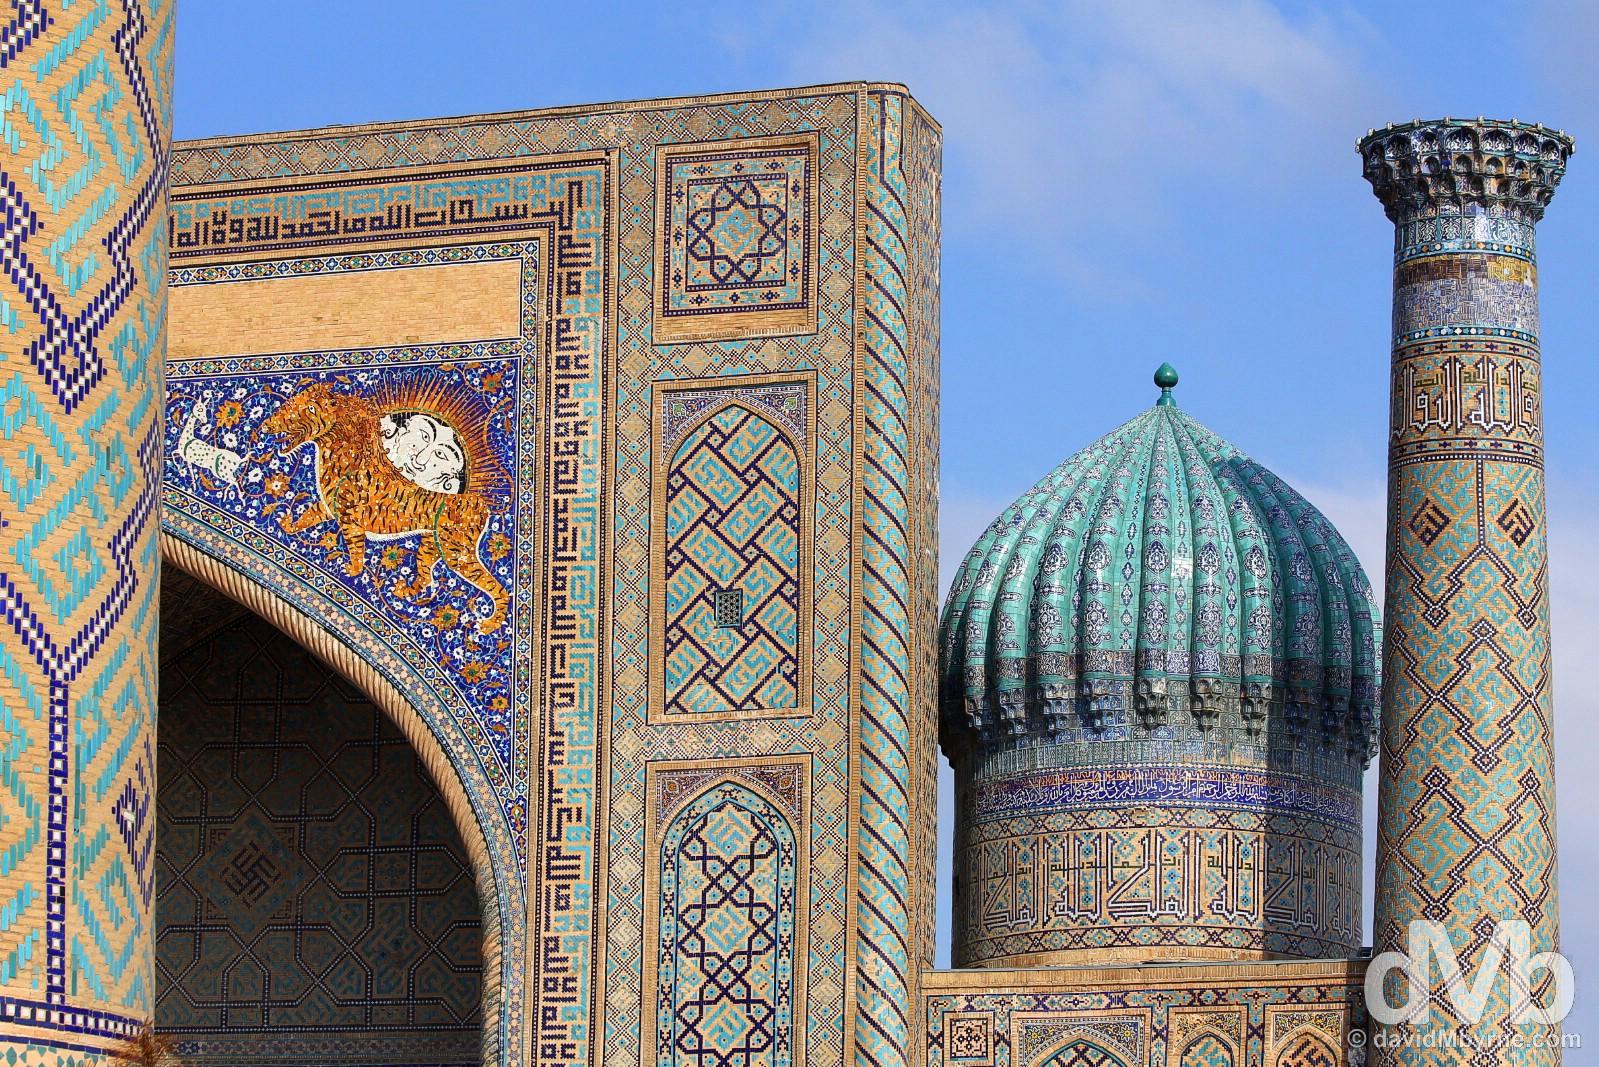 The Registan, Samarkand, Uzbekistan. March 8, 2015.